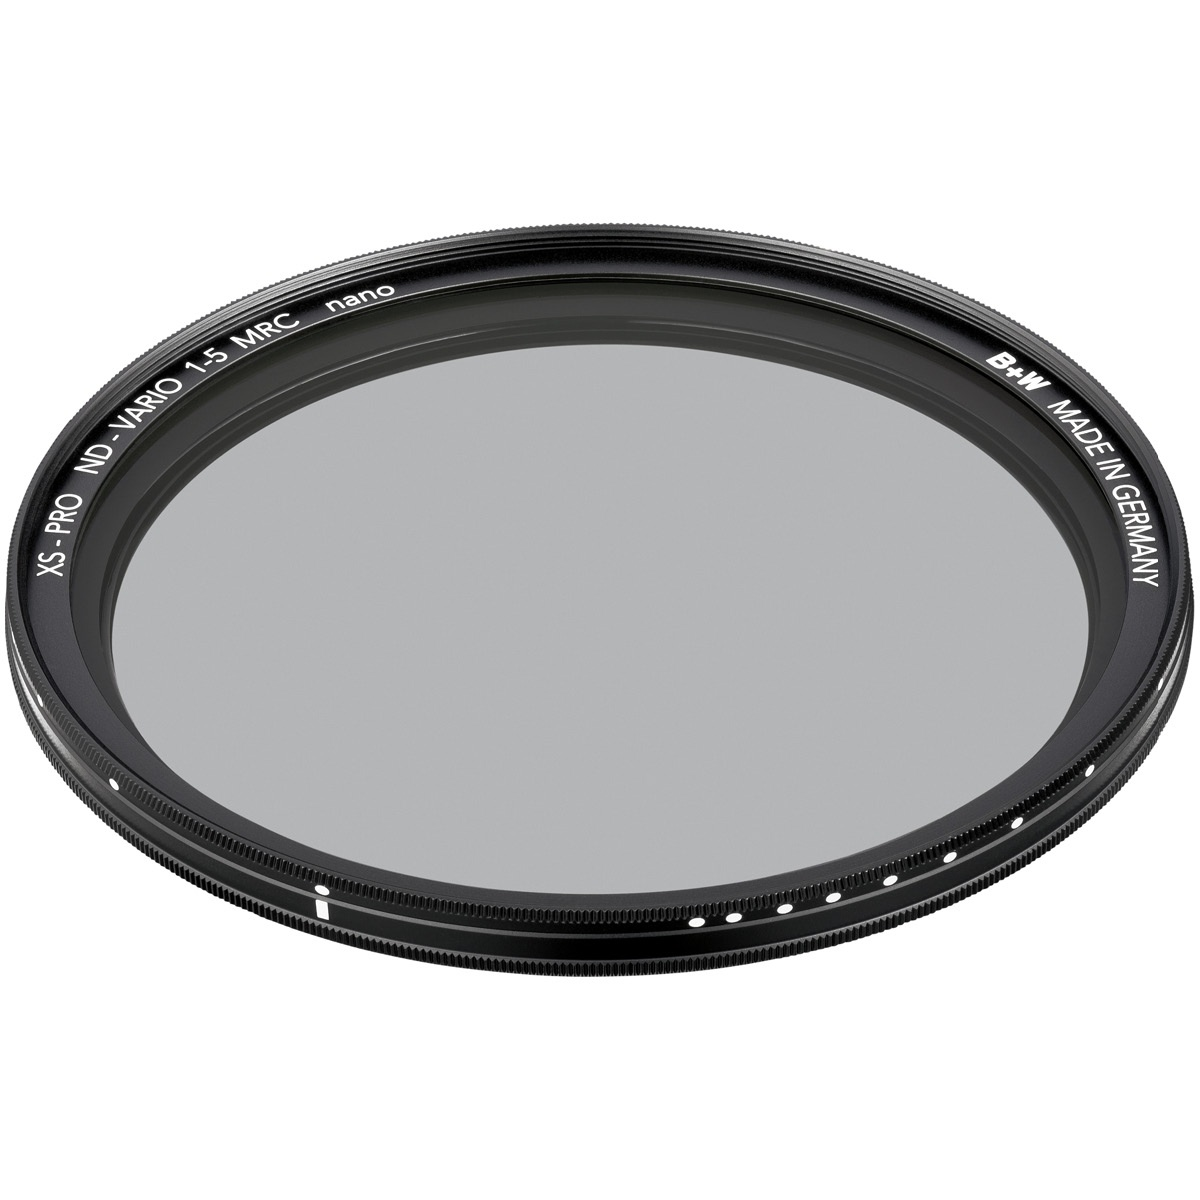 B+W Graufilter 46 mm XS-Pro Vario +1 - +5